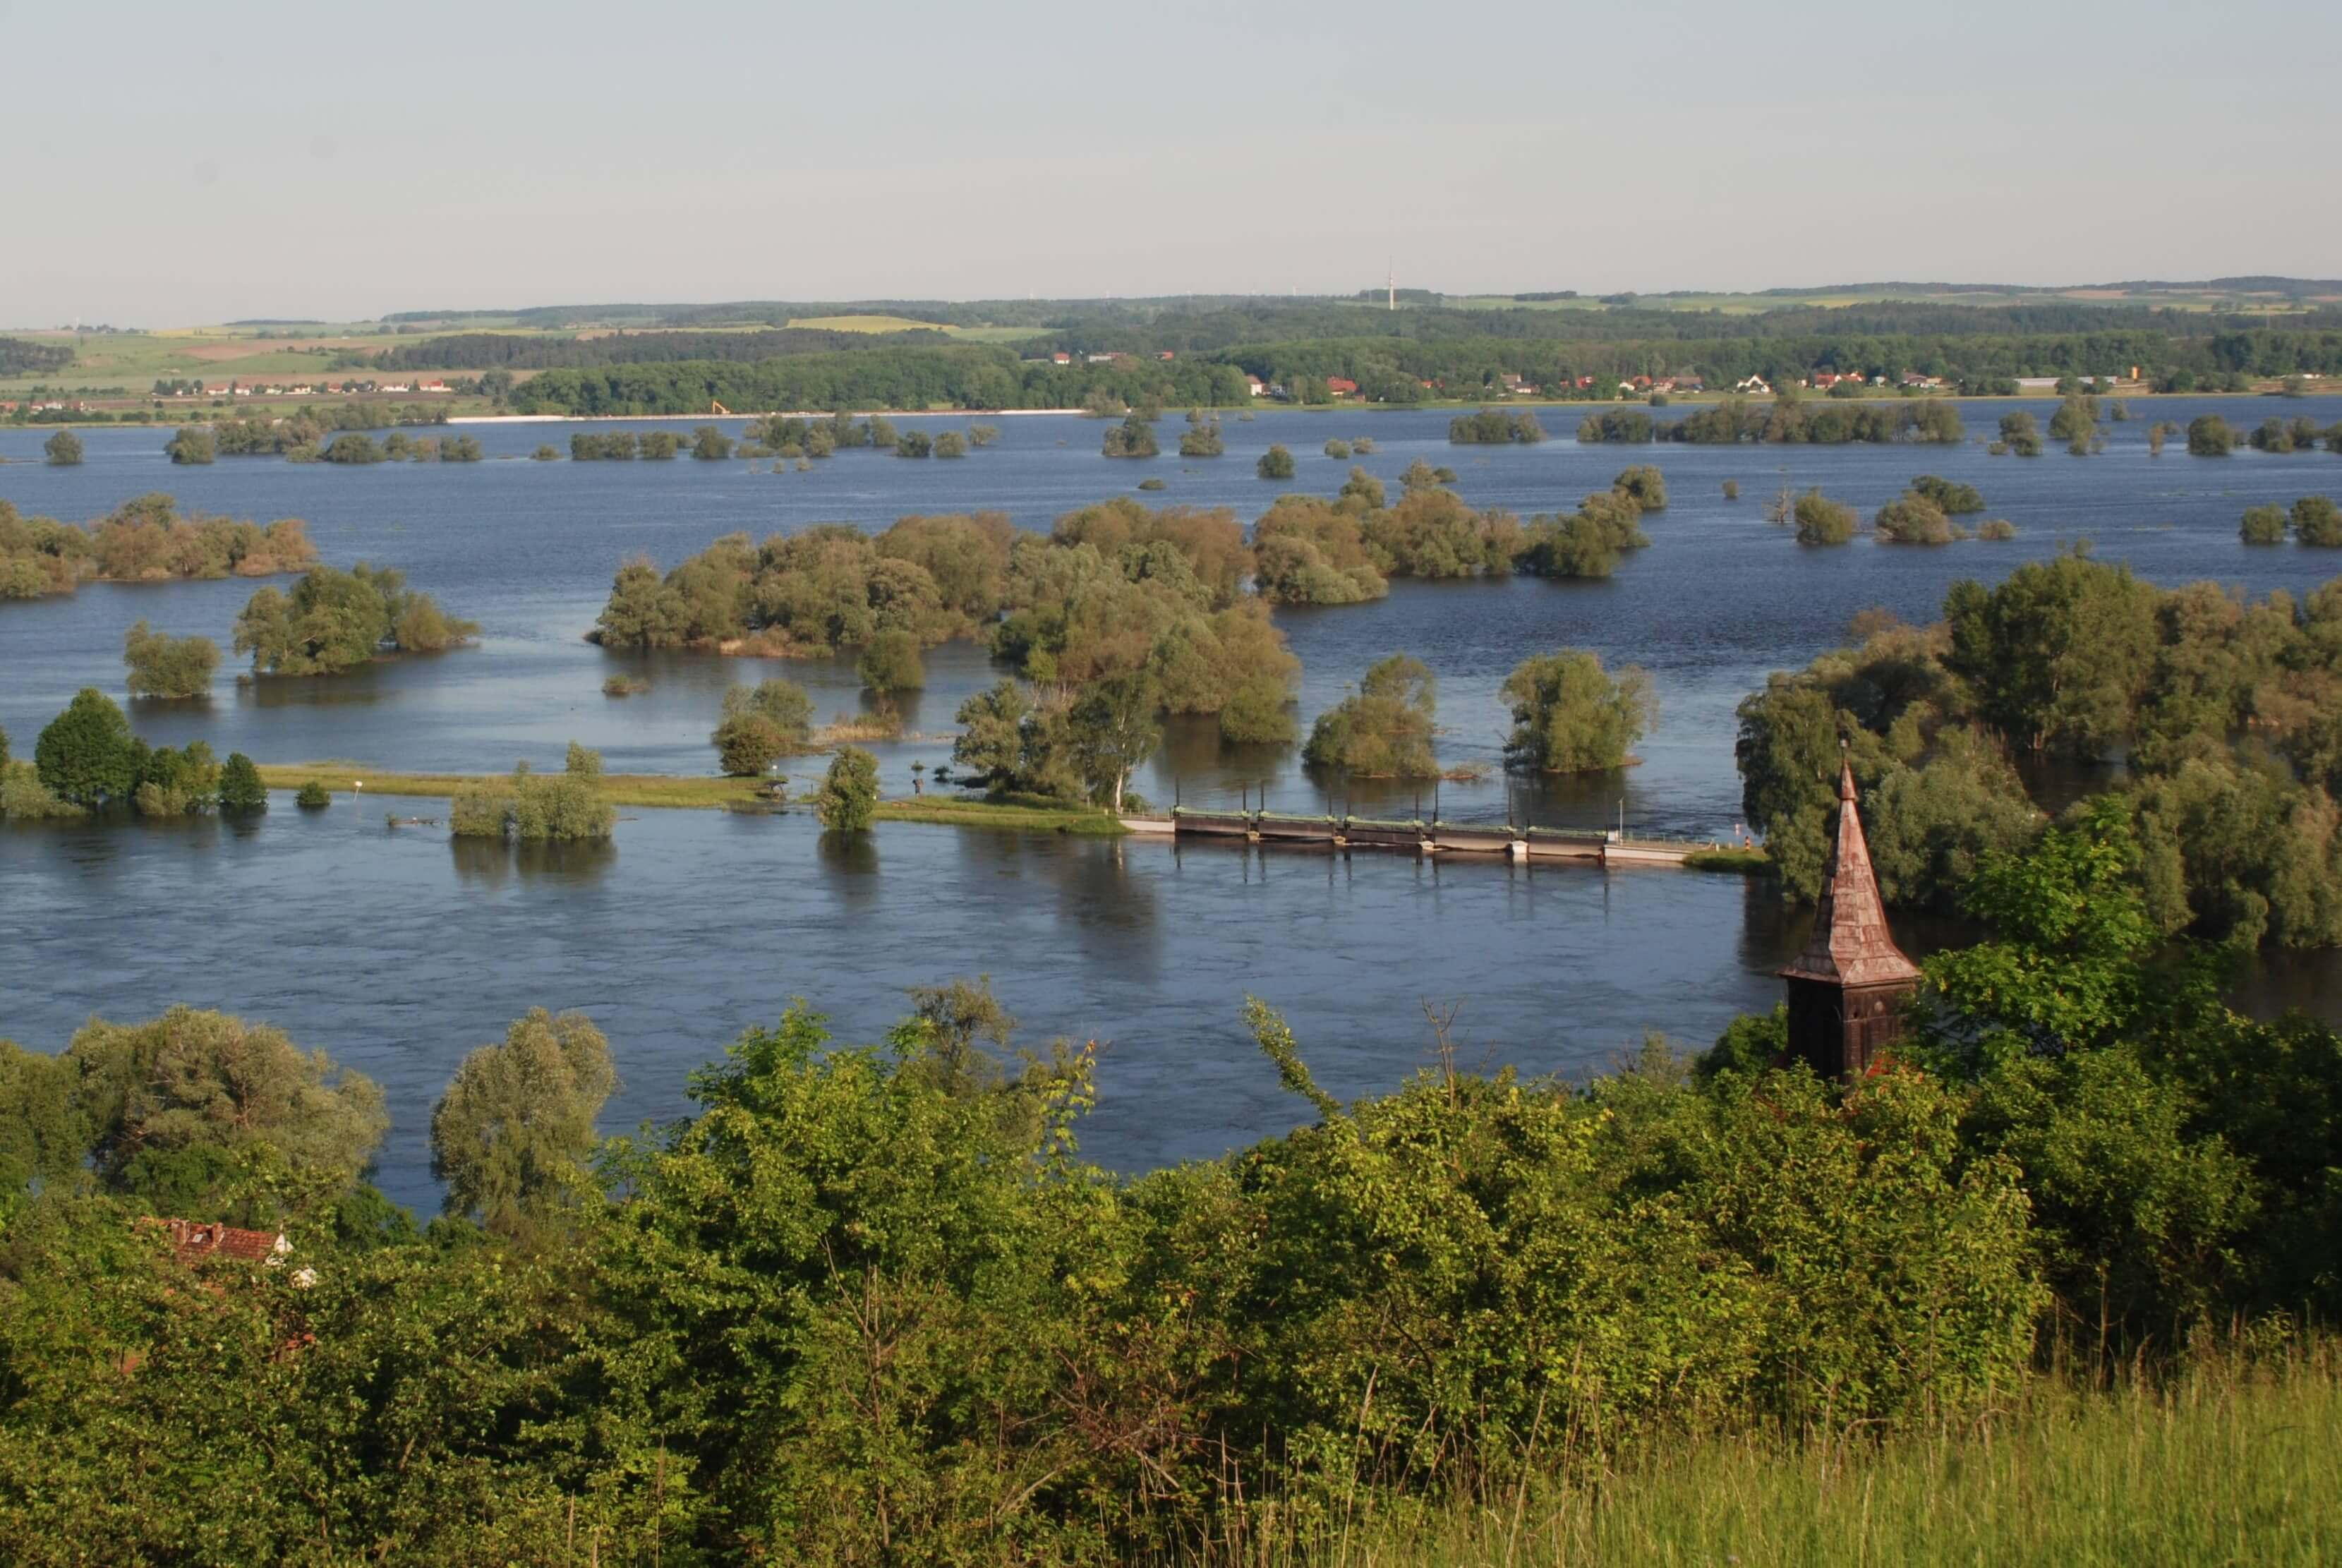 Nationalpark Unteres Odertal - Ausblick Frühjahrsflutung